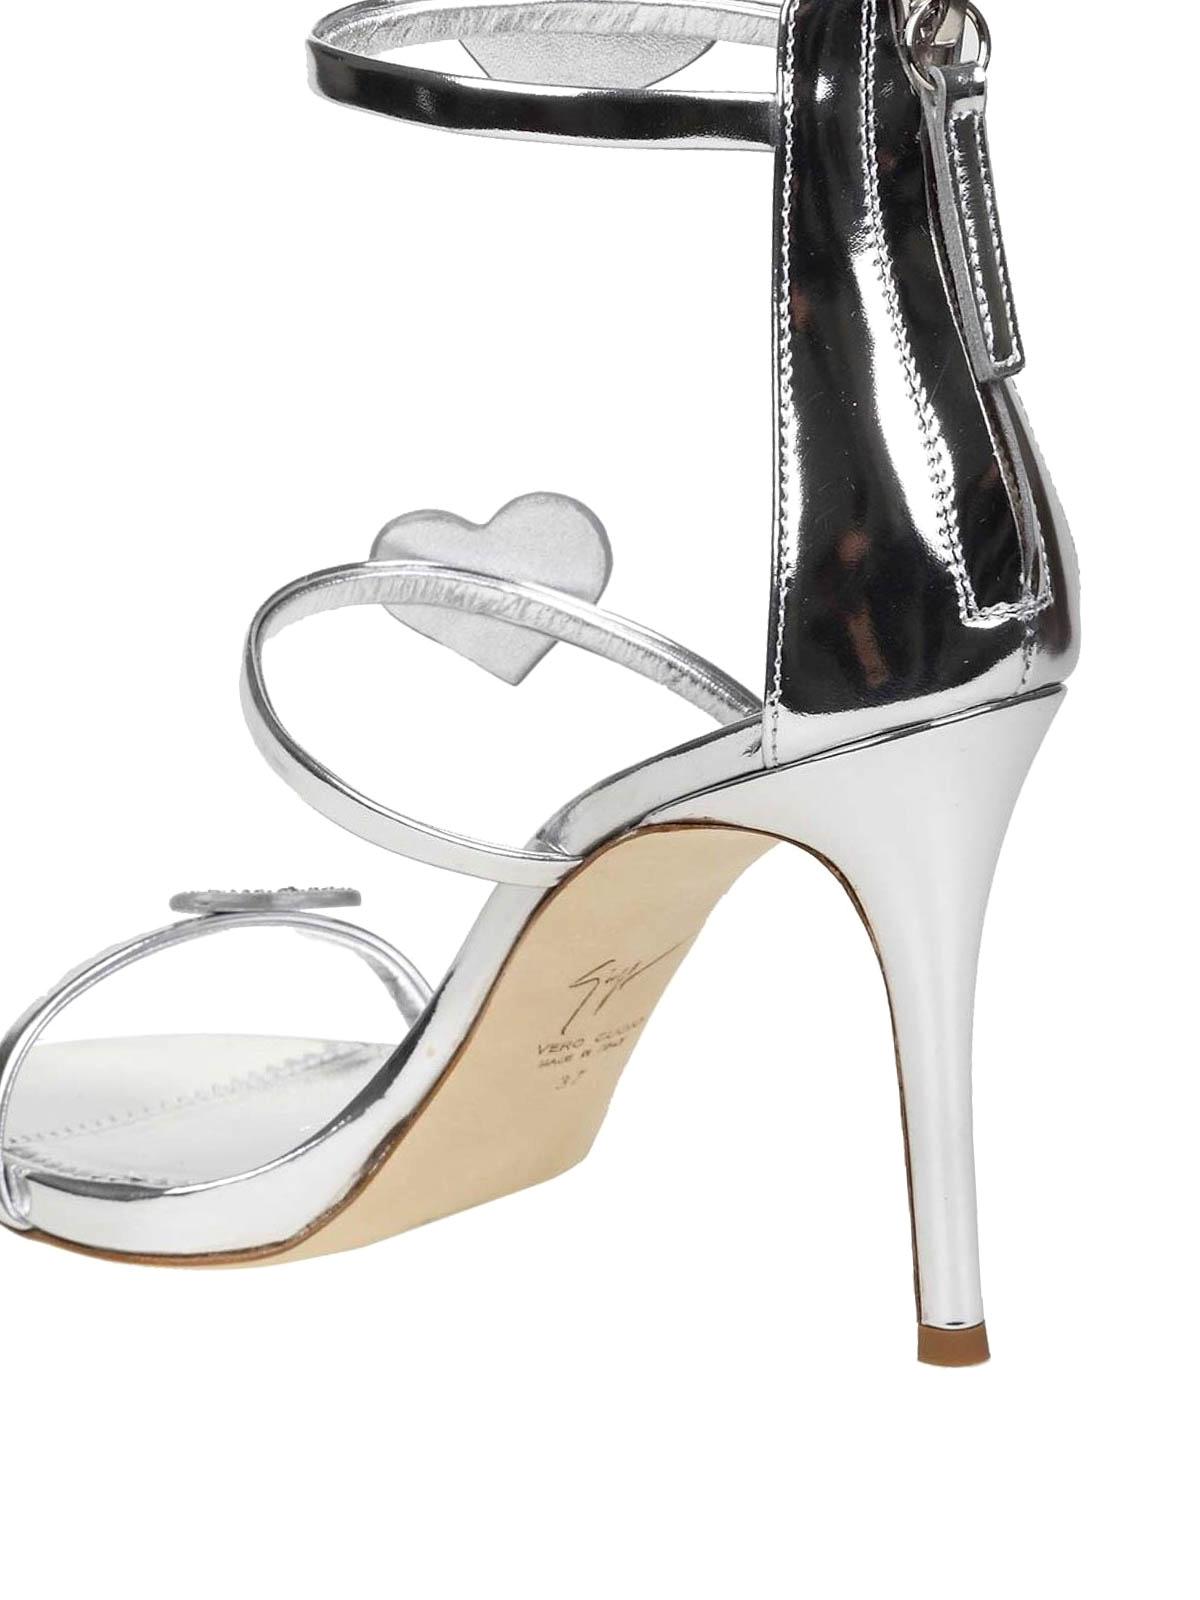 eecd52e88 Giuseppe Zanotti - Harmony Love mirror leather sandals - sandals ...